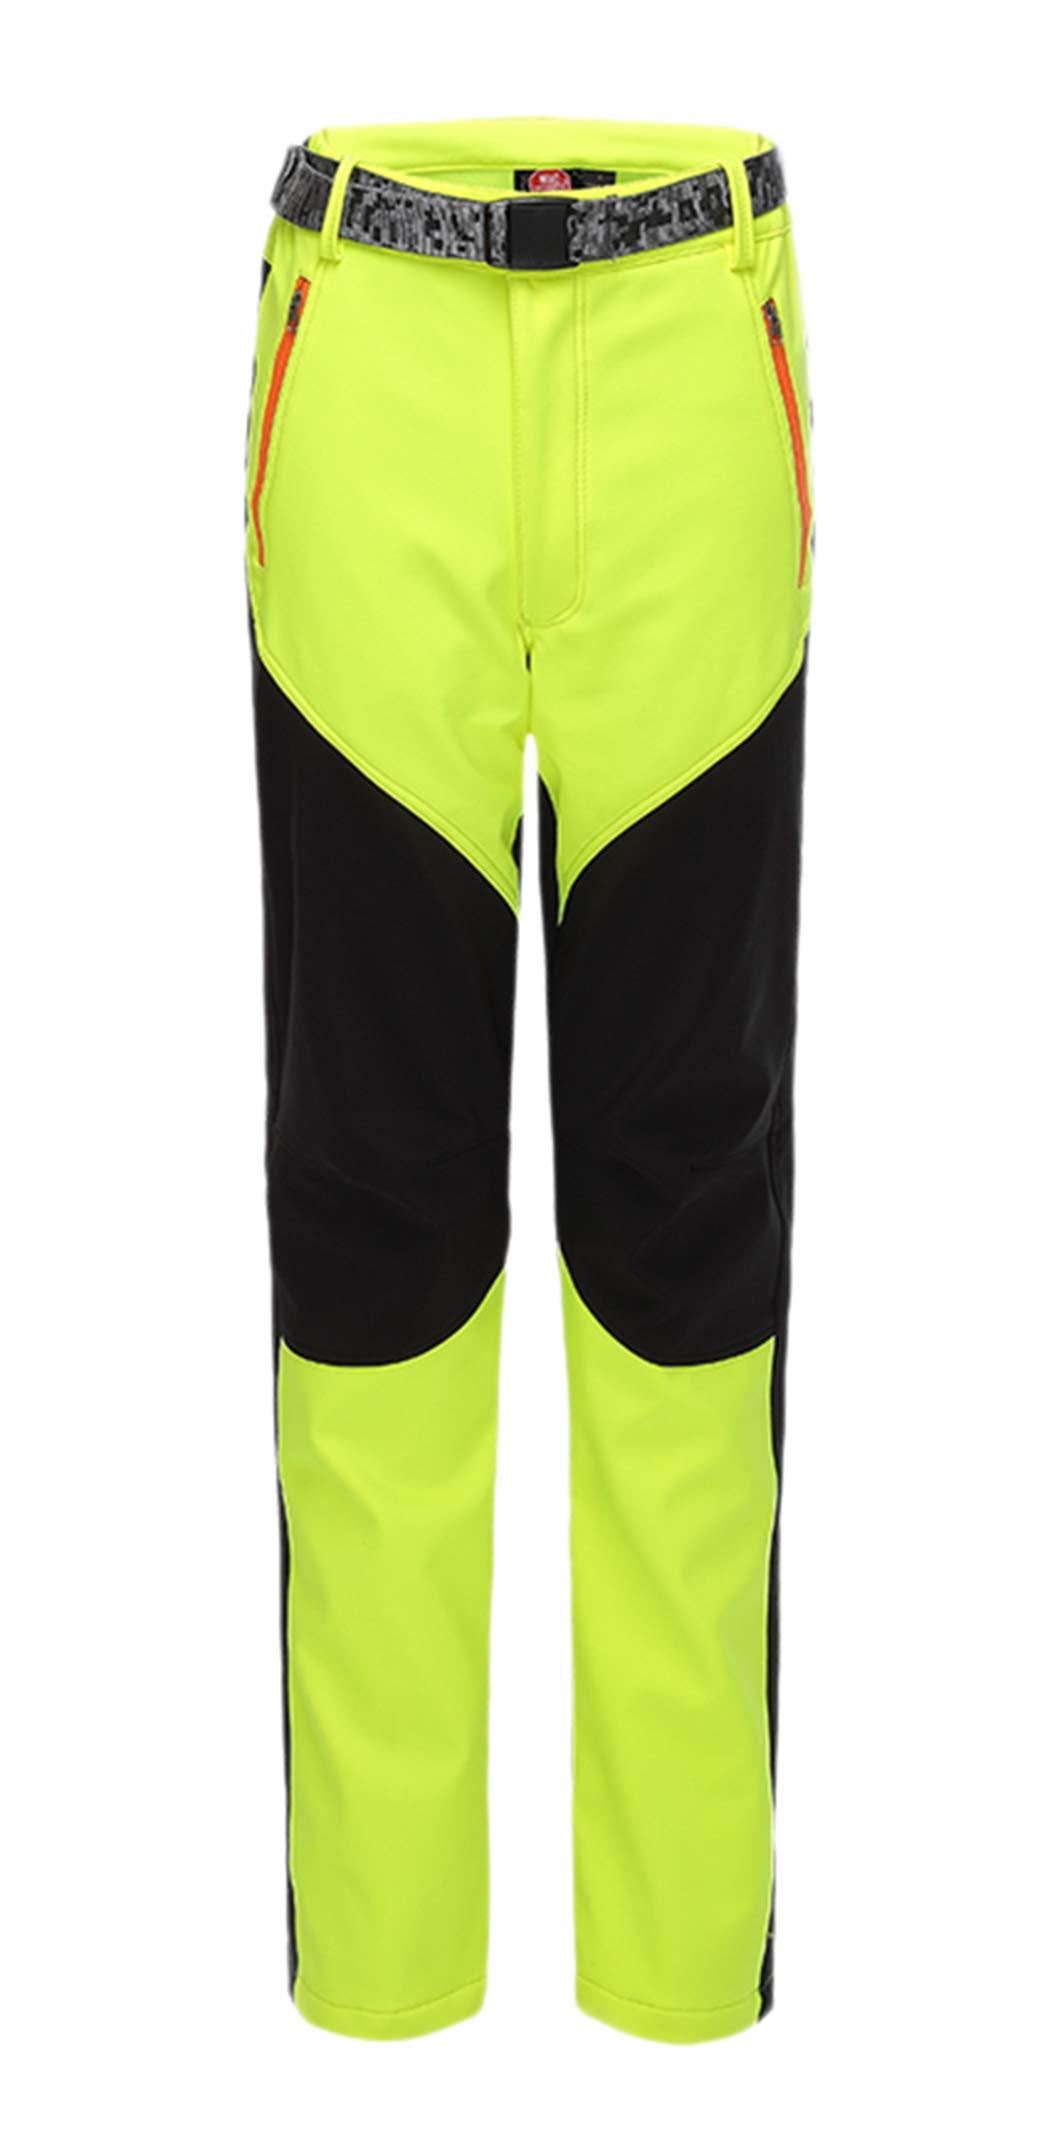 CATERTO Women's Outdoor Windproof Waterproof Softshell Fleece Snow Pants Green L by CATERTO